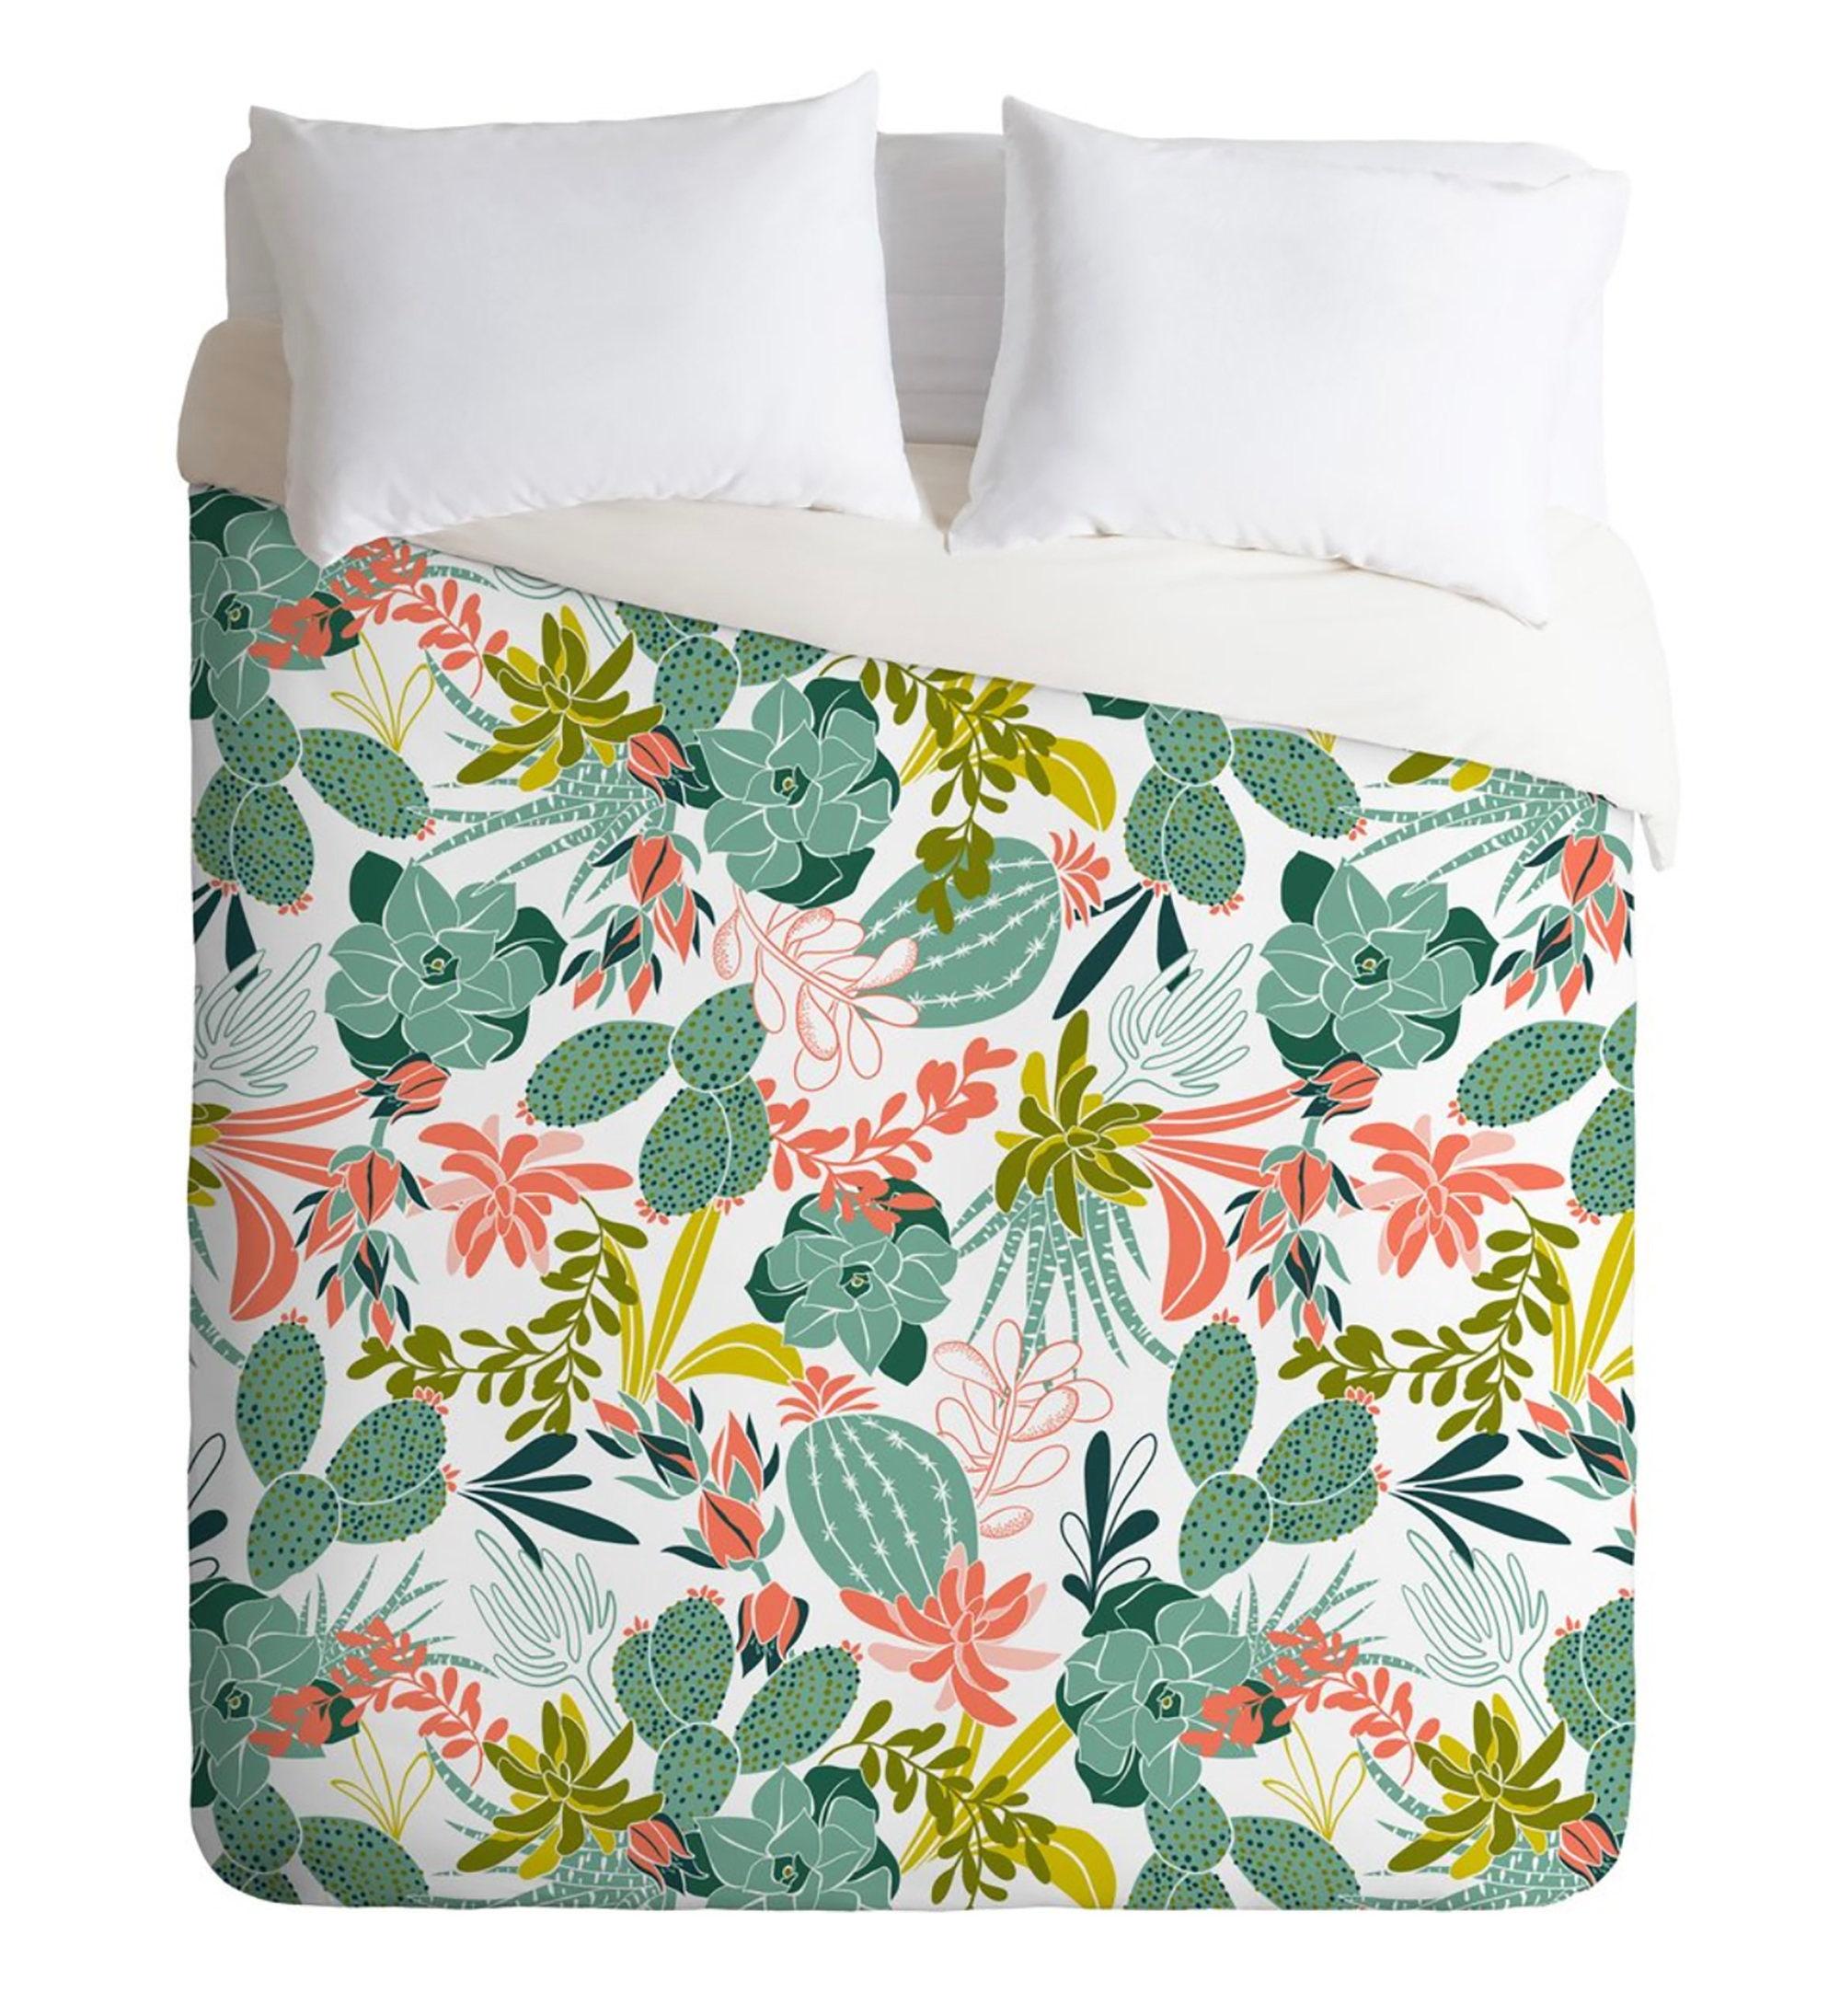 Boho Duvet Cover // Twin, Queen, King Sizes // Bedding // Succulent Garden White Design // Duvet // Succulent // Cactus // Boho Home